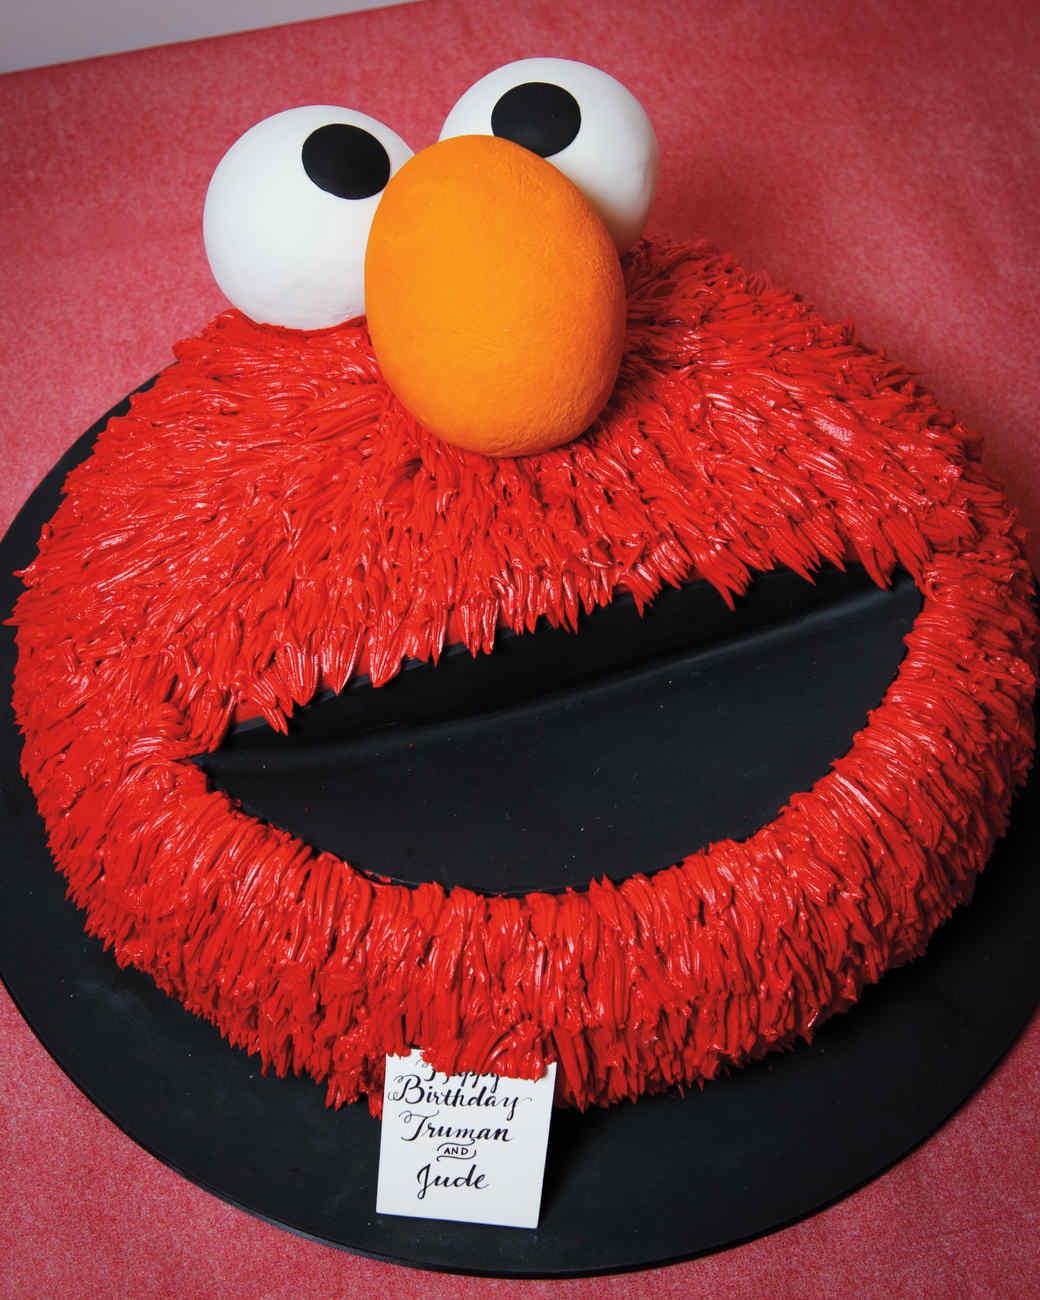 Celebrating With Elmo: Birthday Party